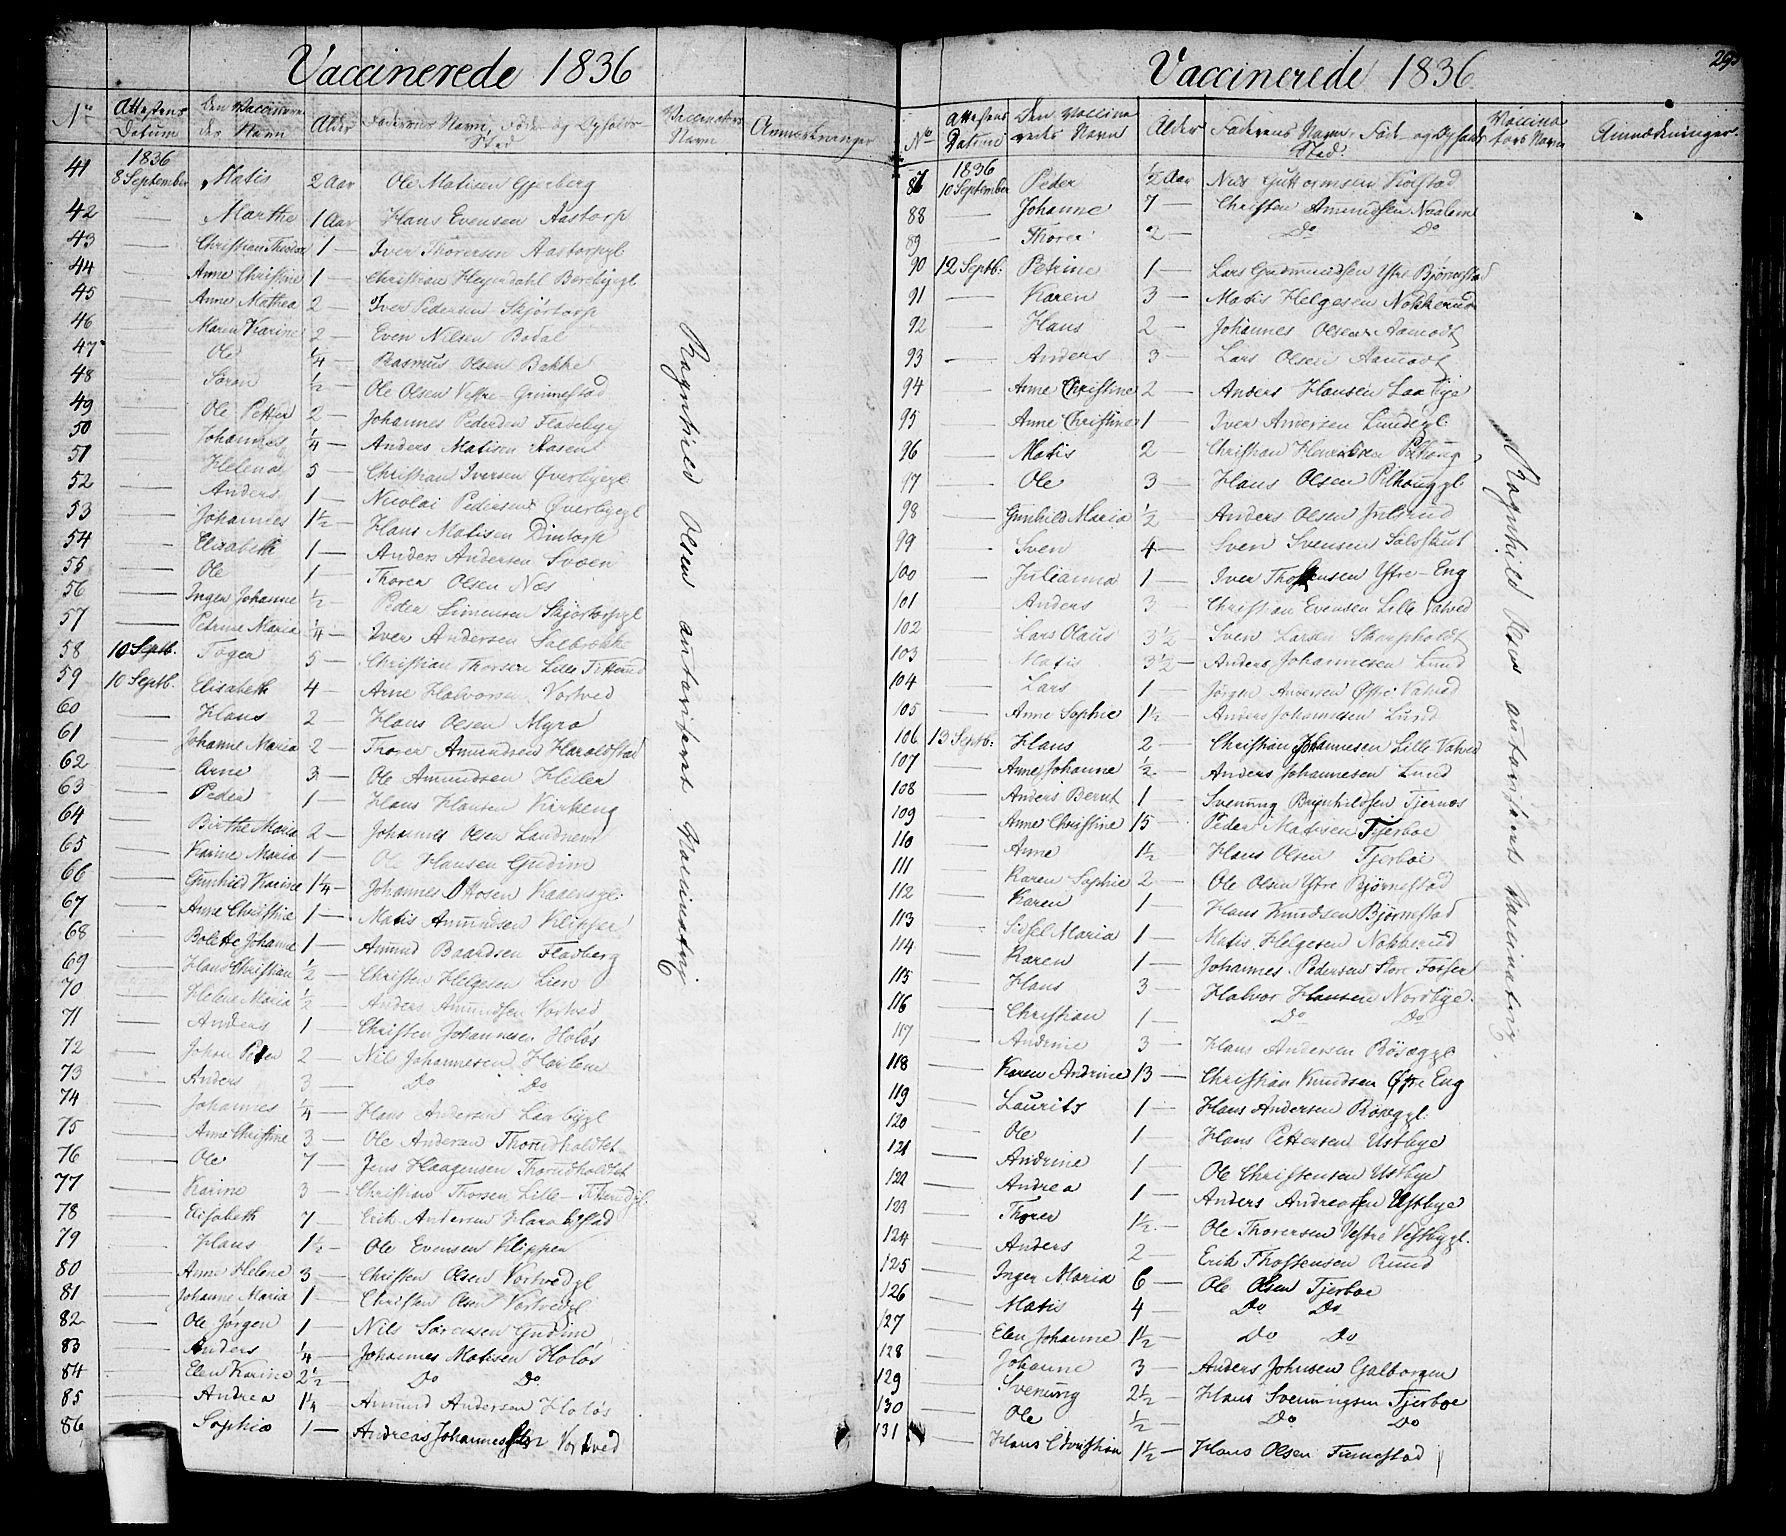 SAO, Rakkestad prestekontor Kirkebøker, F/Fa/L0007: Ministerialbok nr. I 7, 1825-1841, s. 295